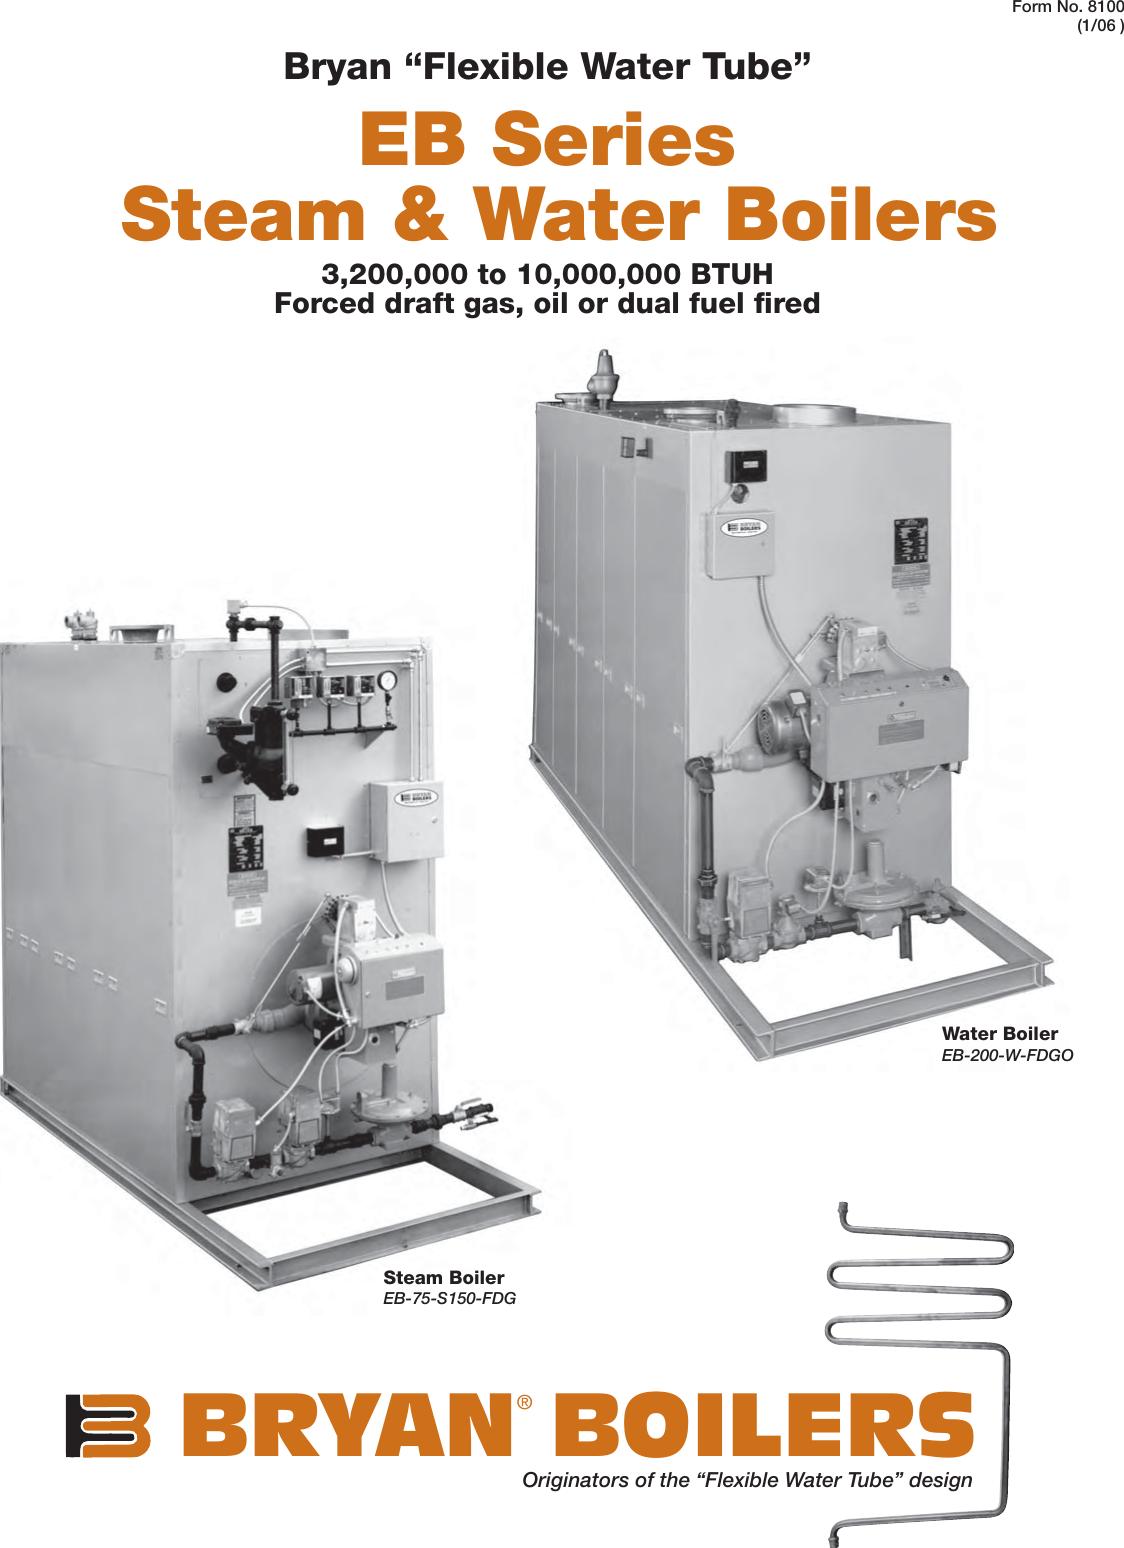 Awesome Bryan Boilers Eb 200 W Fdgo Users Manual Bys7447 Eb Steam Water Boilers Wiring Cloud Usnesfoxcilixyz